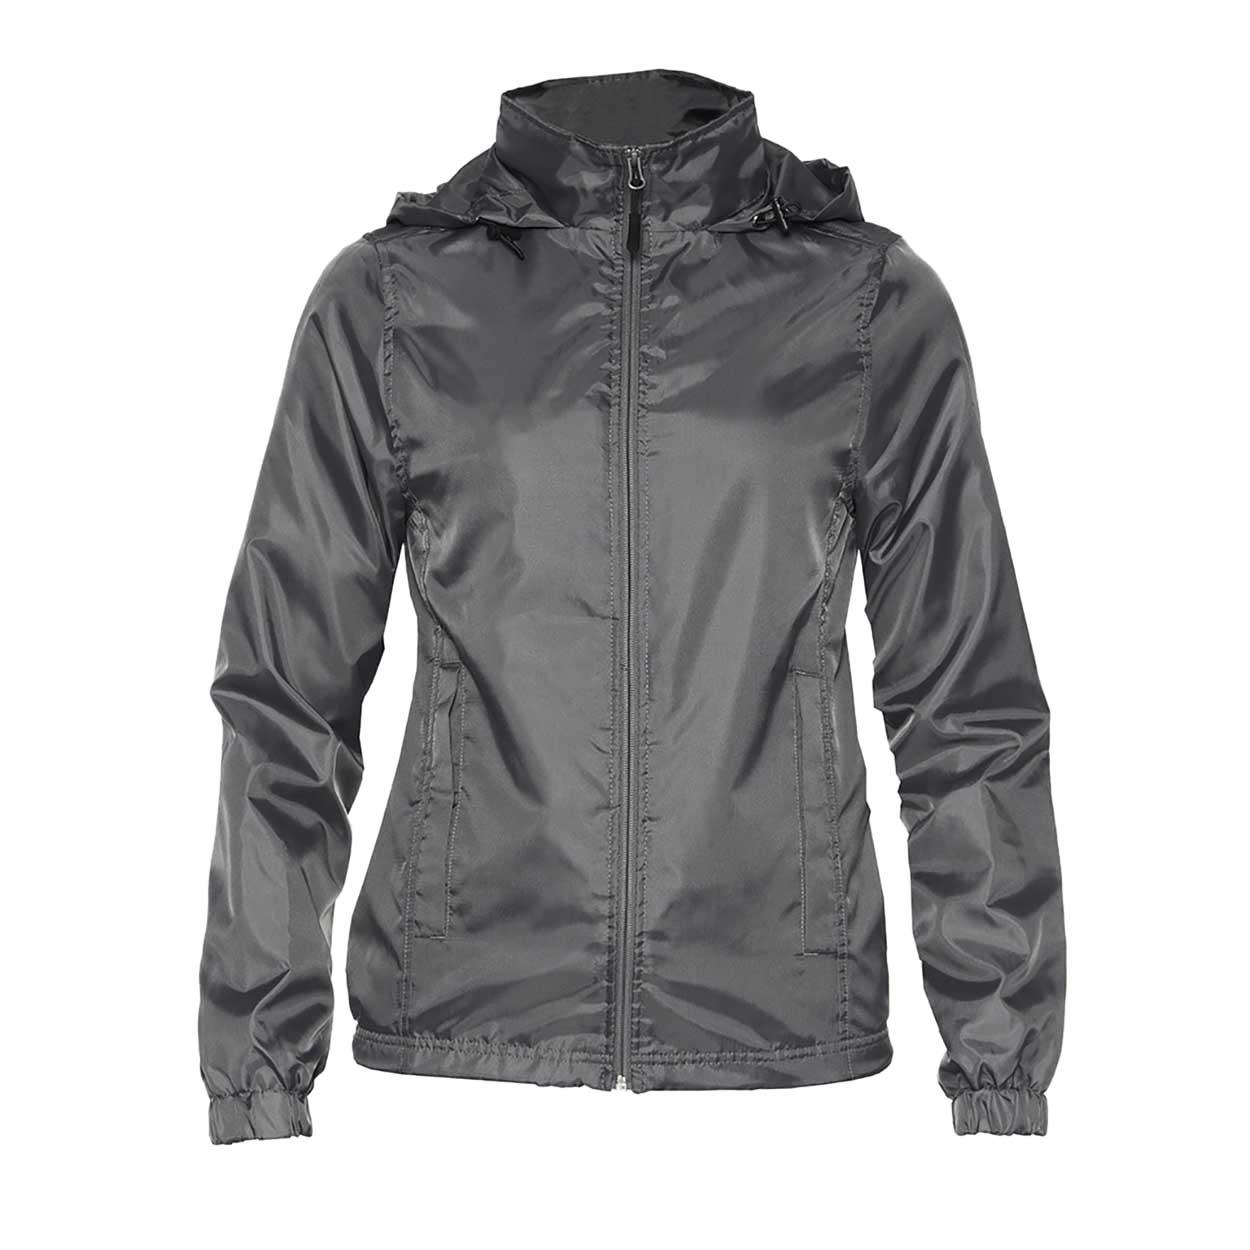 Gildan Womens/Ladies Hammer Windwear Jacket (L) (Charcoal)